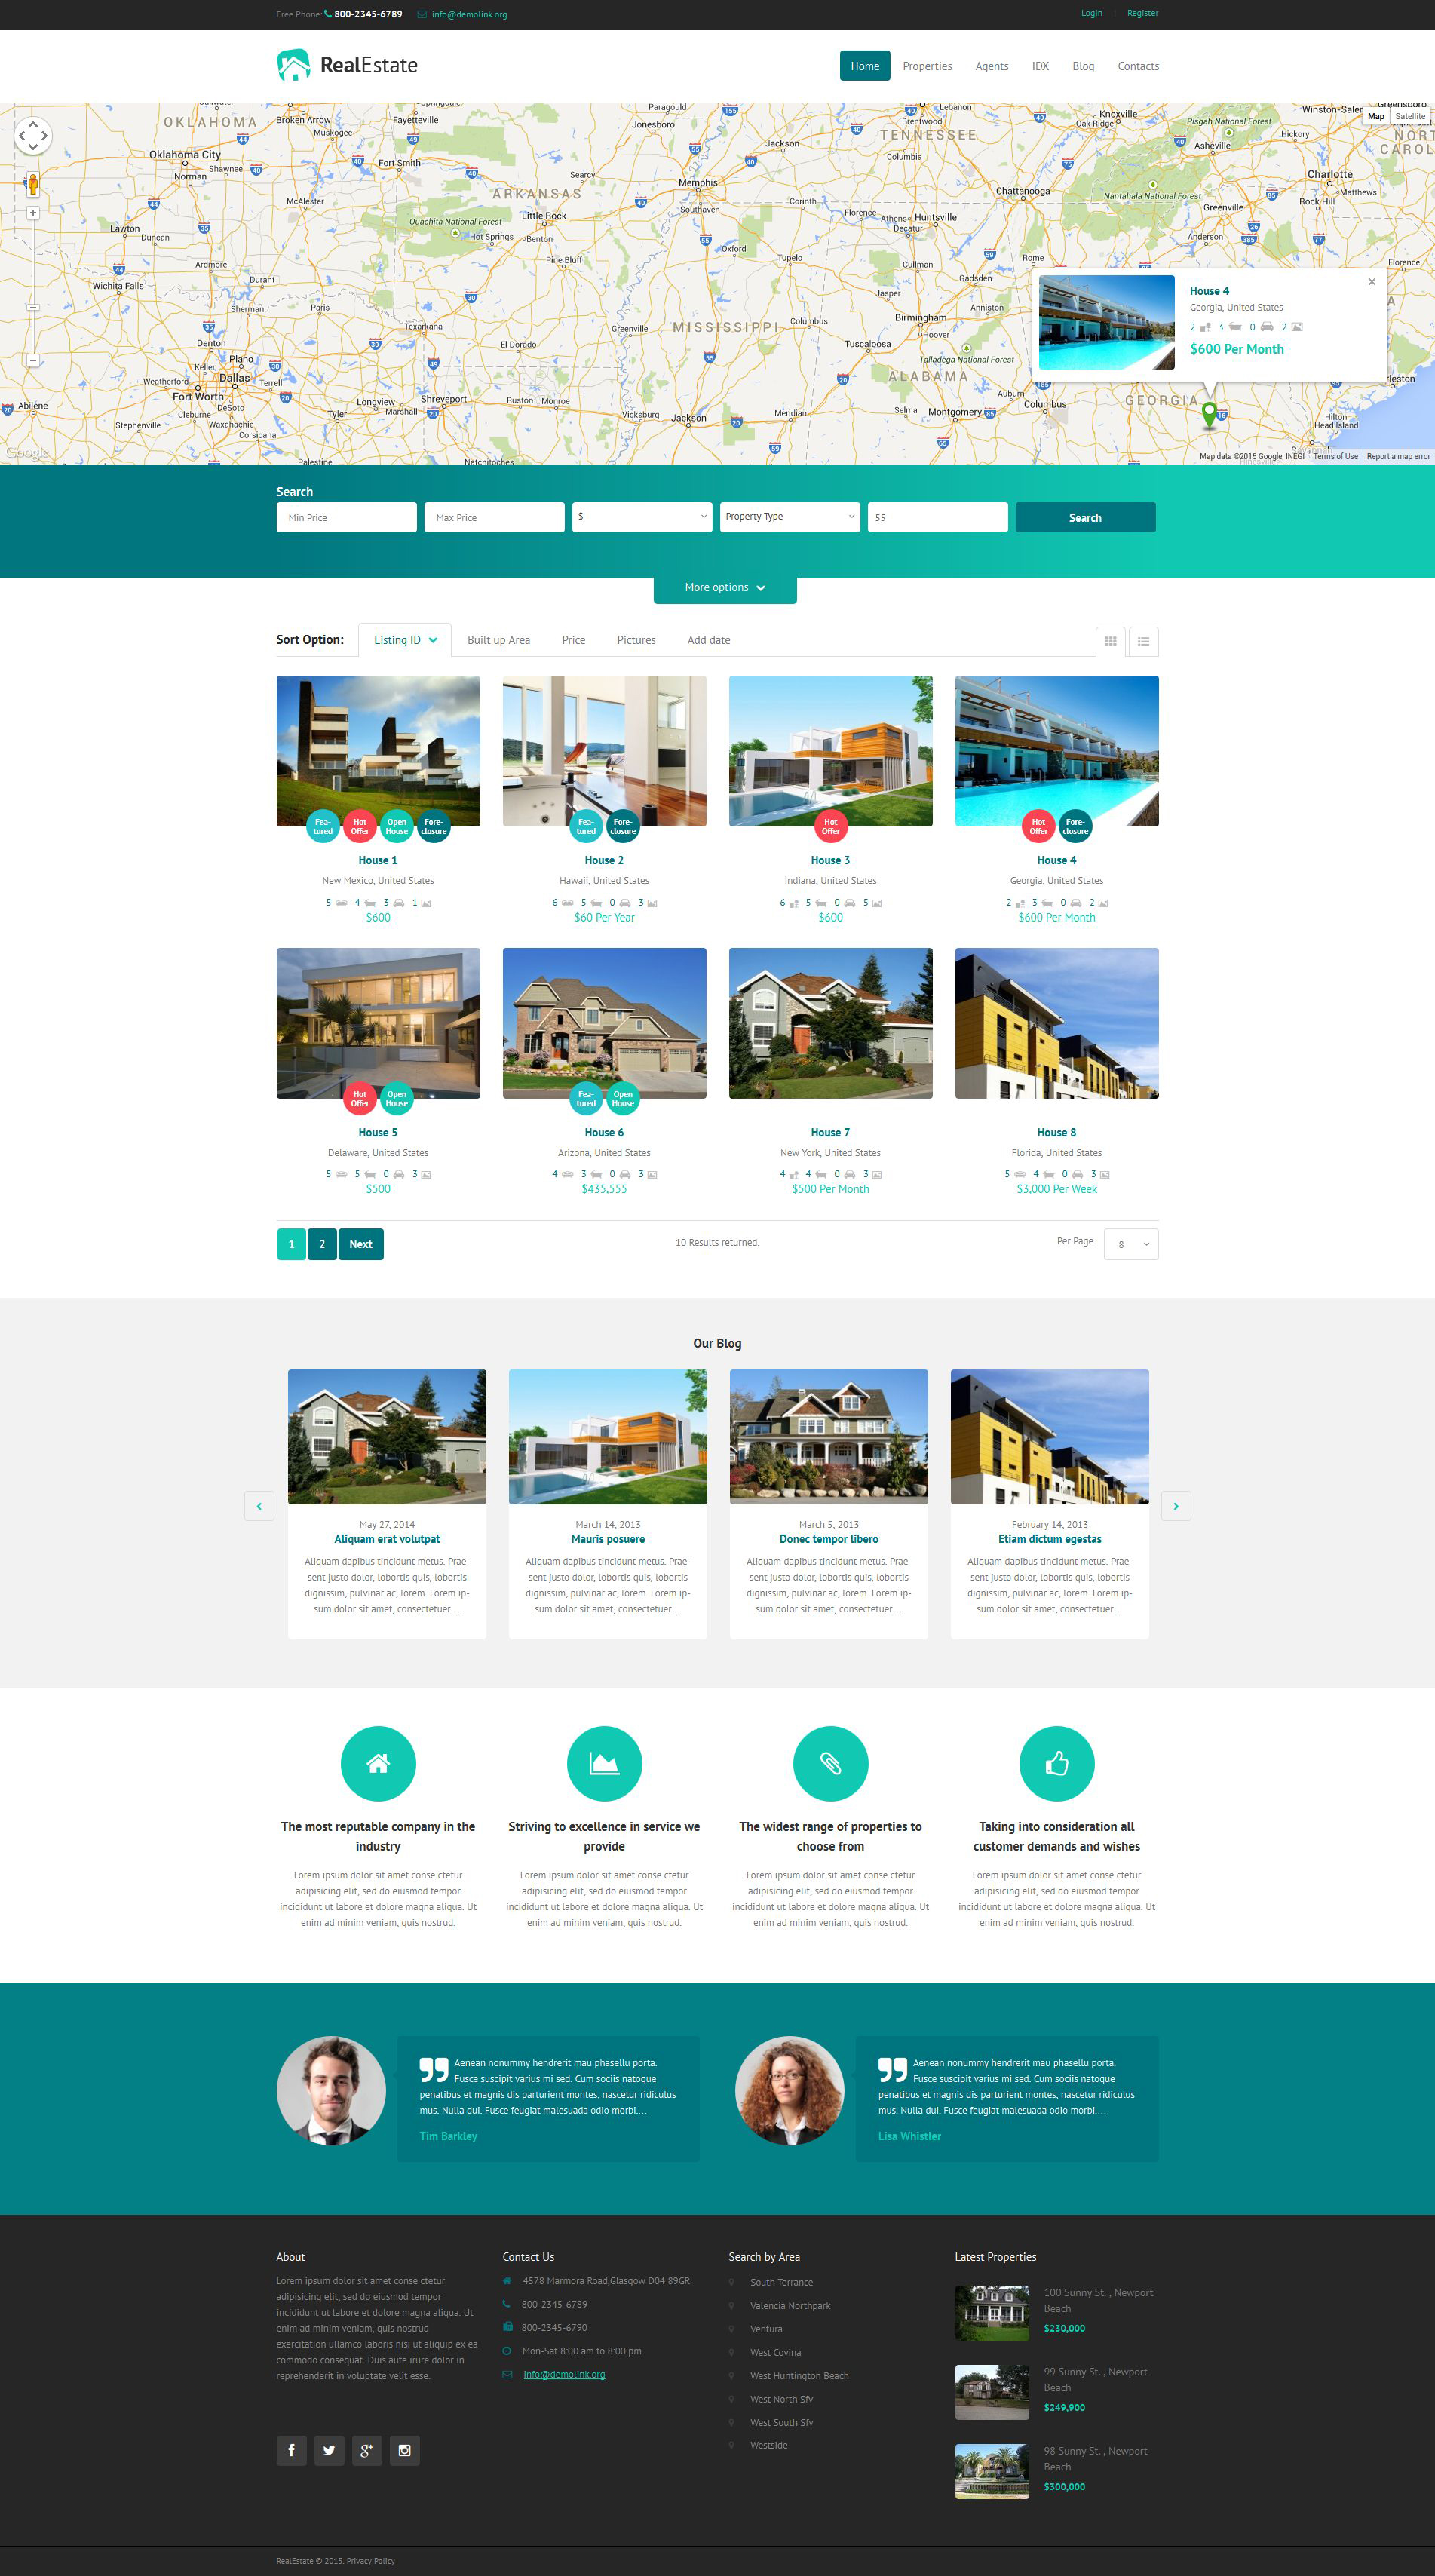 Thème WordPress adaptatif pour site d'agence immobilière #52837 - screenshot